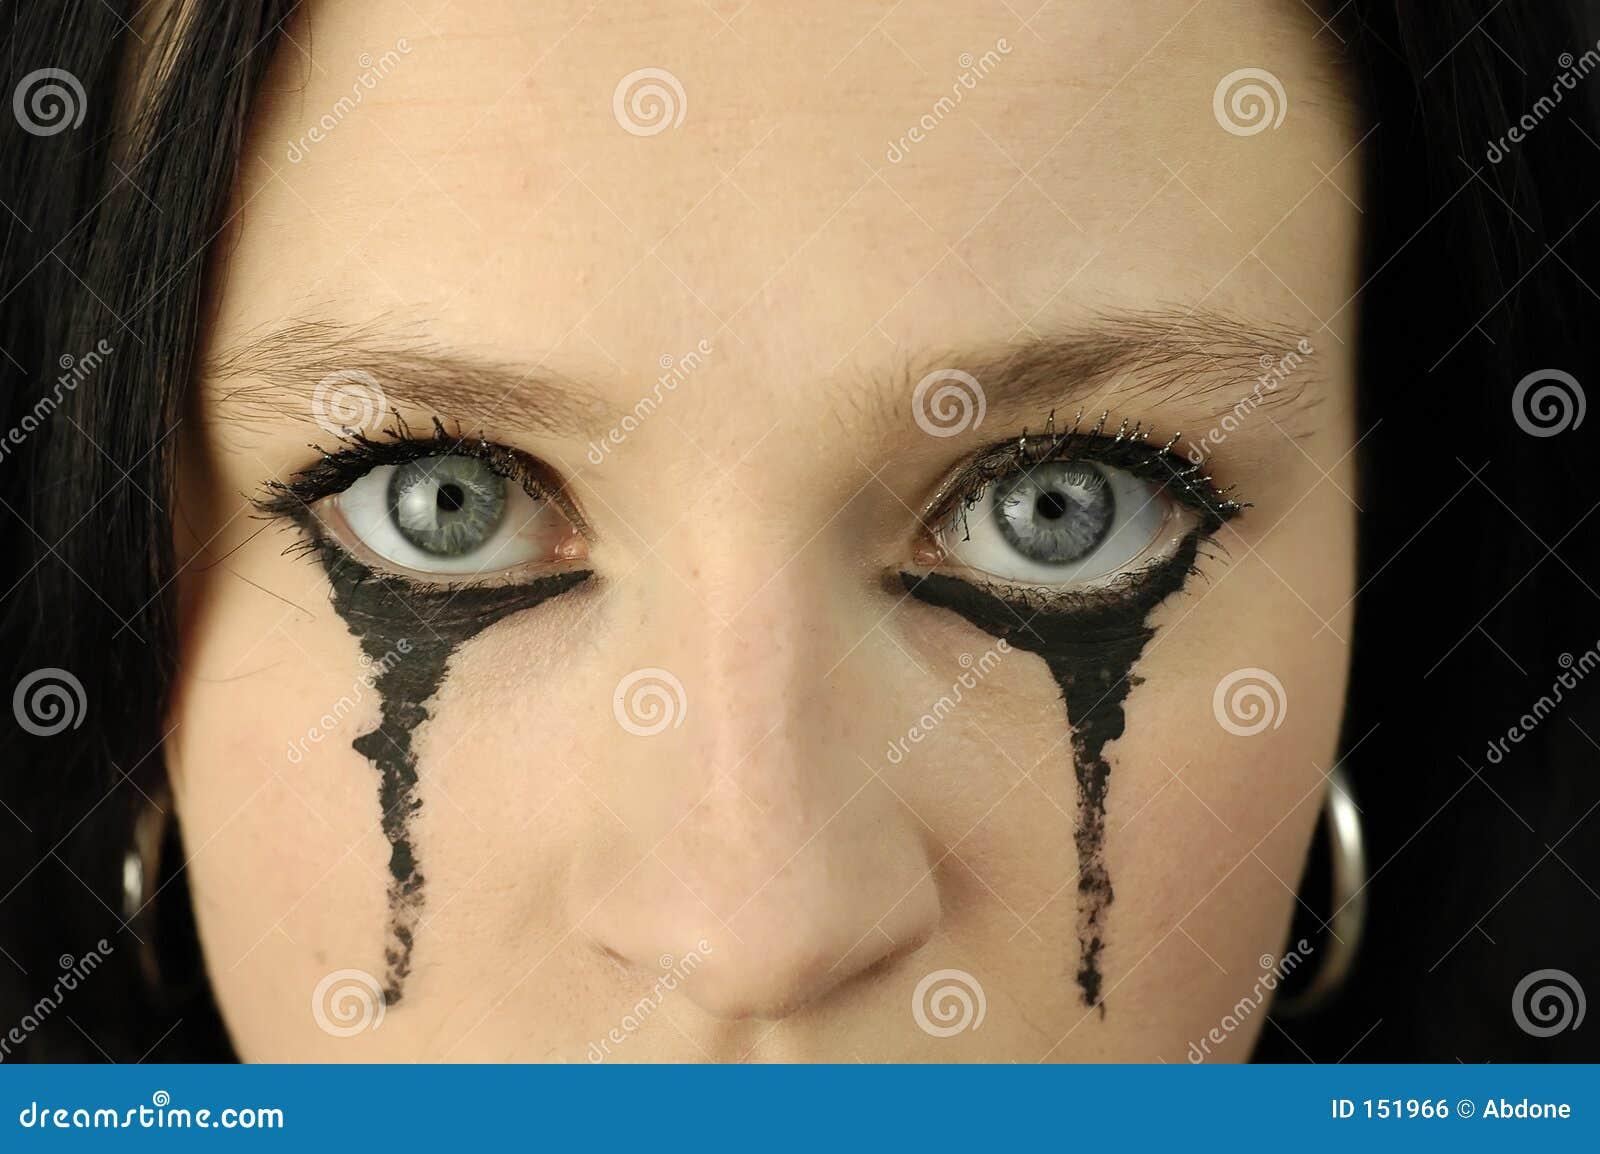 Woman s eyes